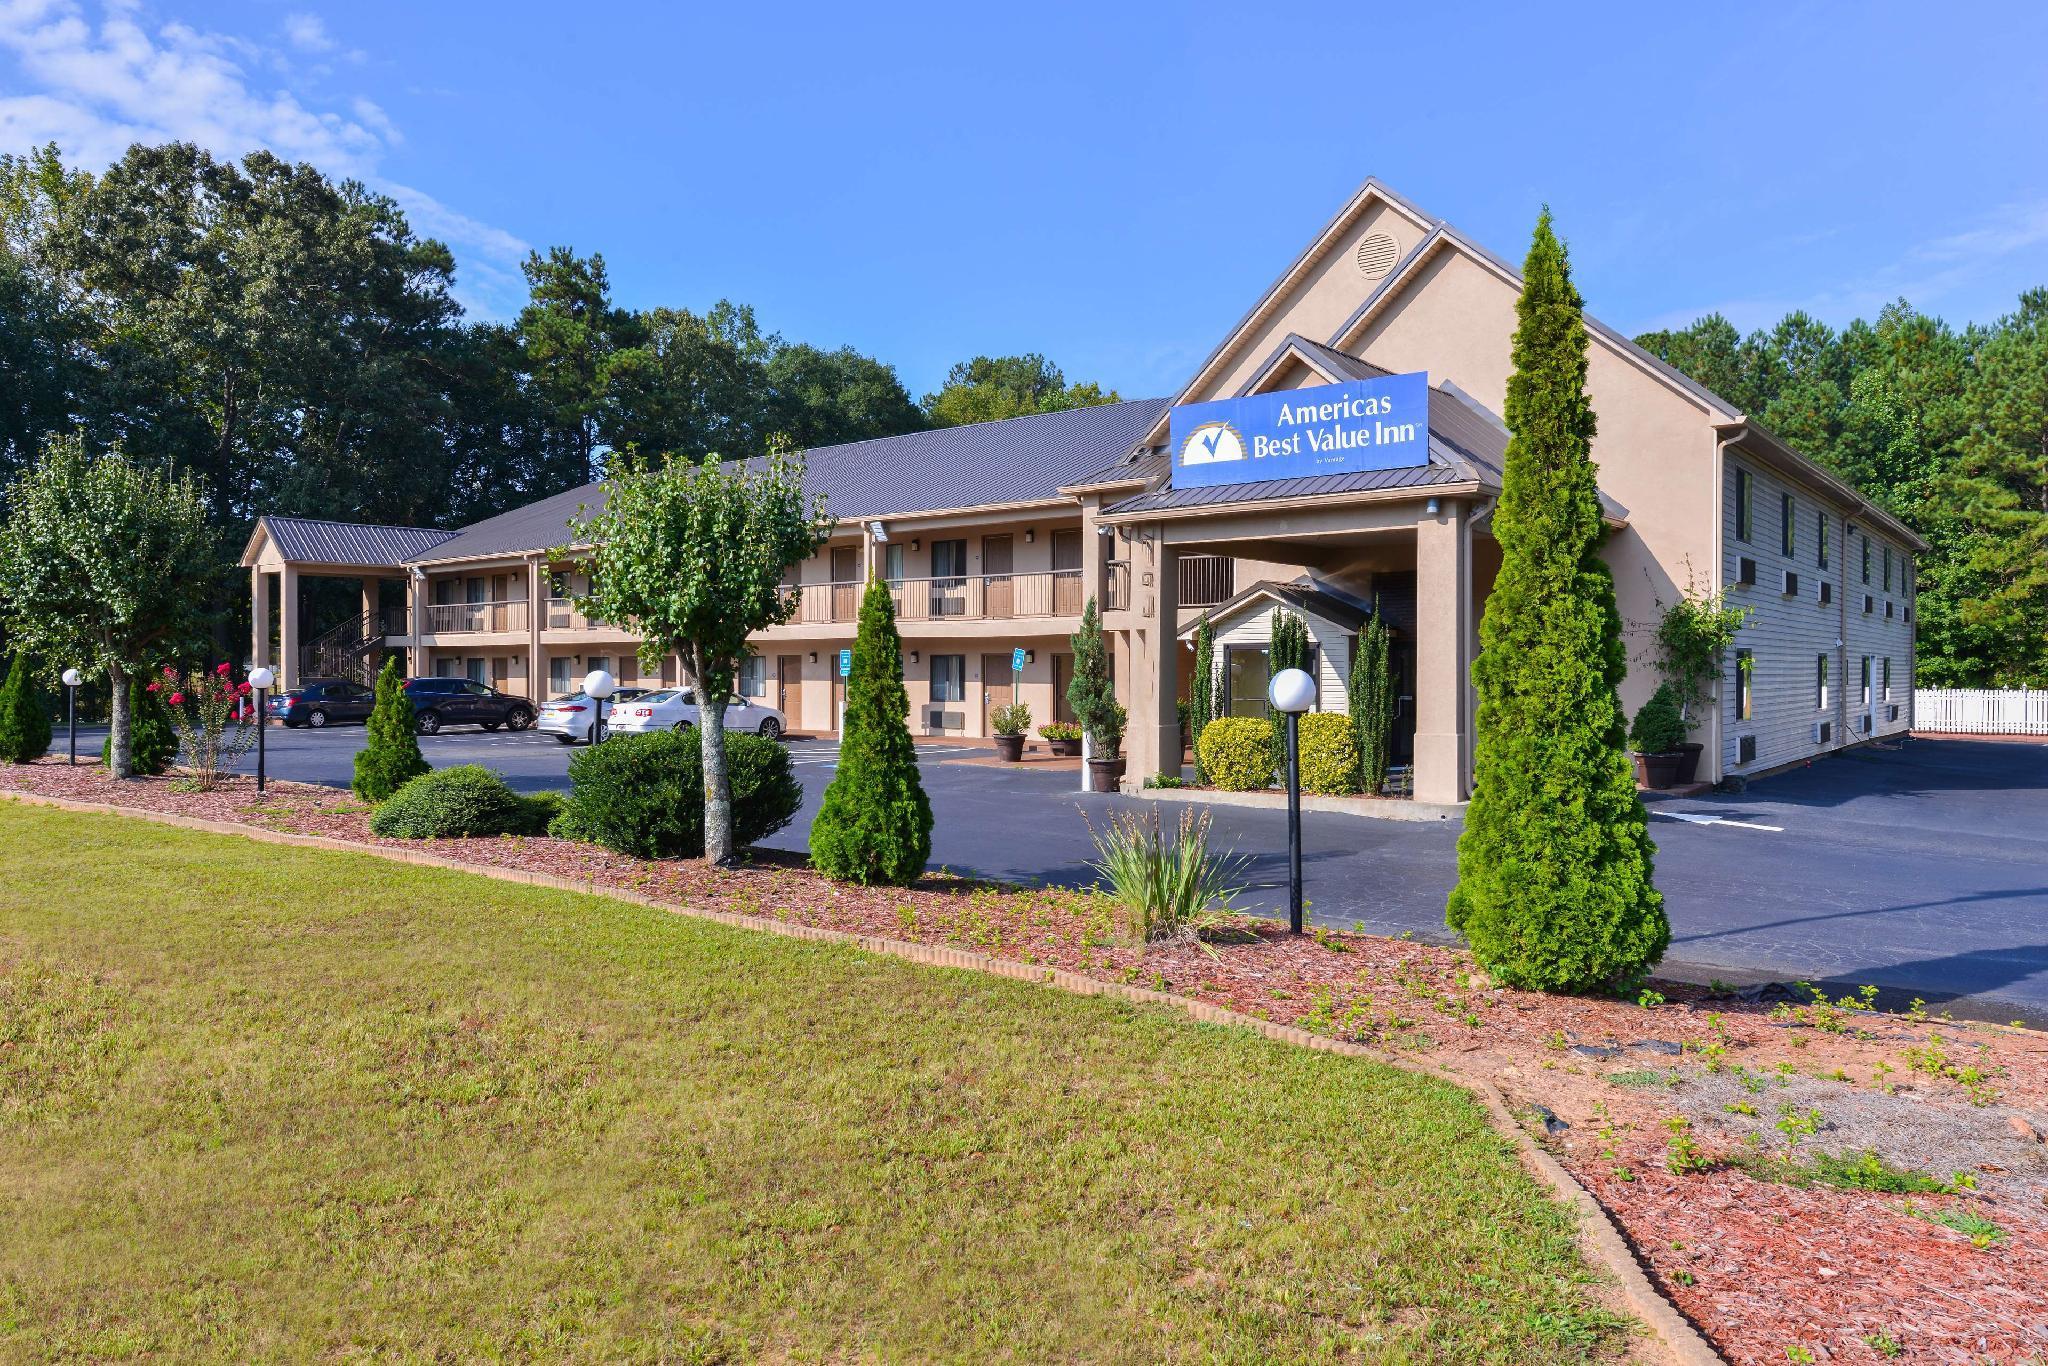 Americas Best Value Inn Acworth Kennesaw